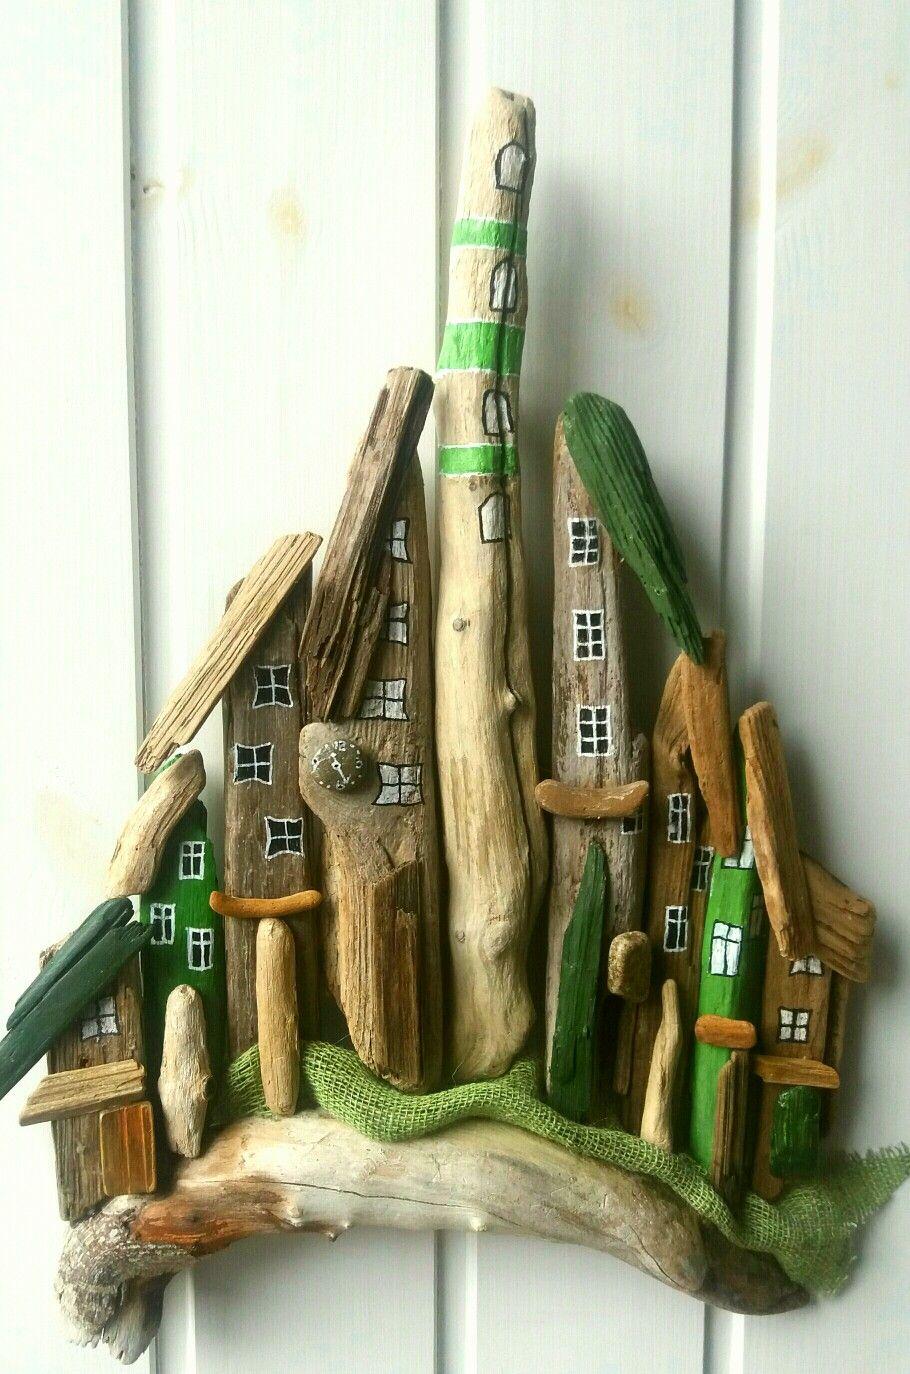 Lille Oliven grøn drivtømmer by. designed by EVAs                                                                                                                                                                                 More #boisflotté